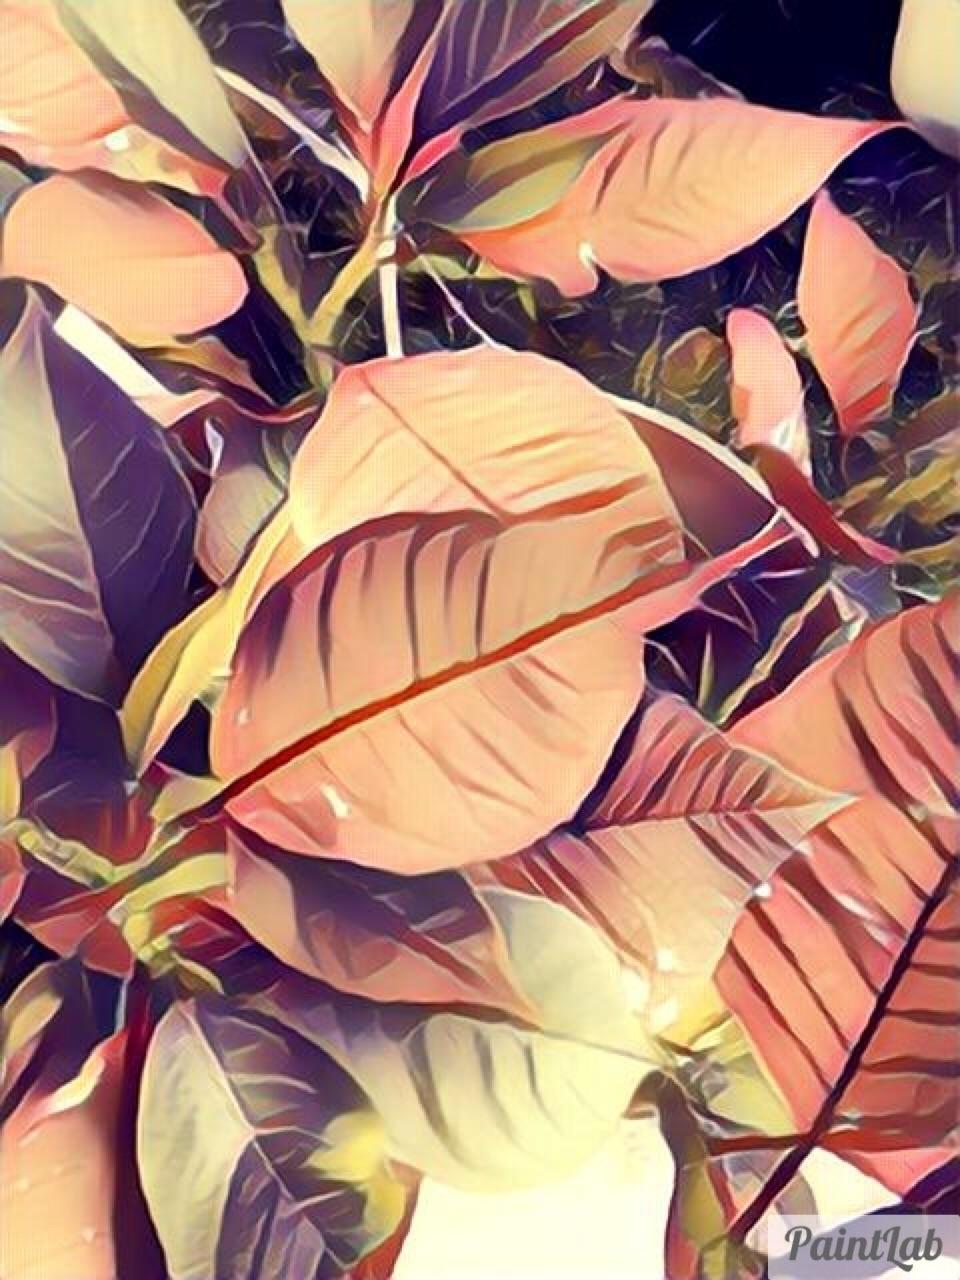 Springtime Plants Garden Apps - mikefl99 - mikefl99 | ello